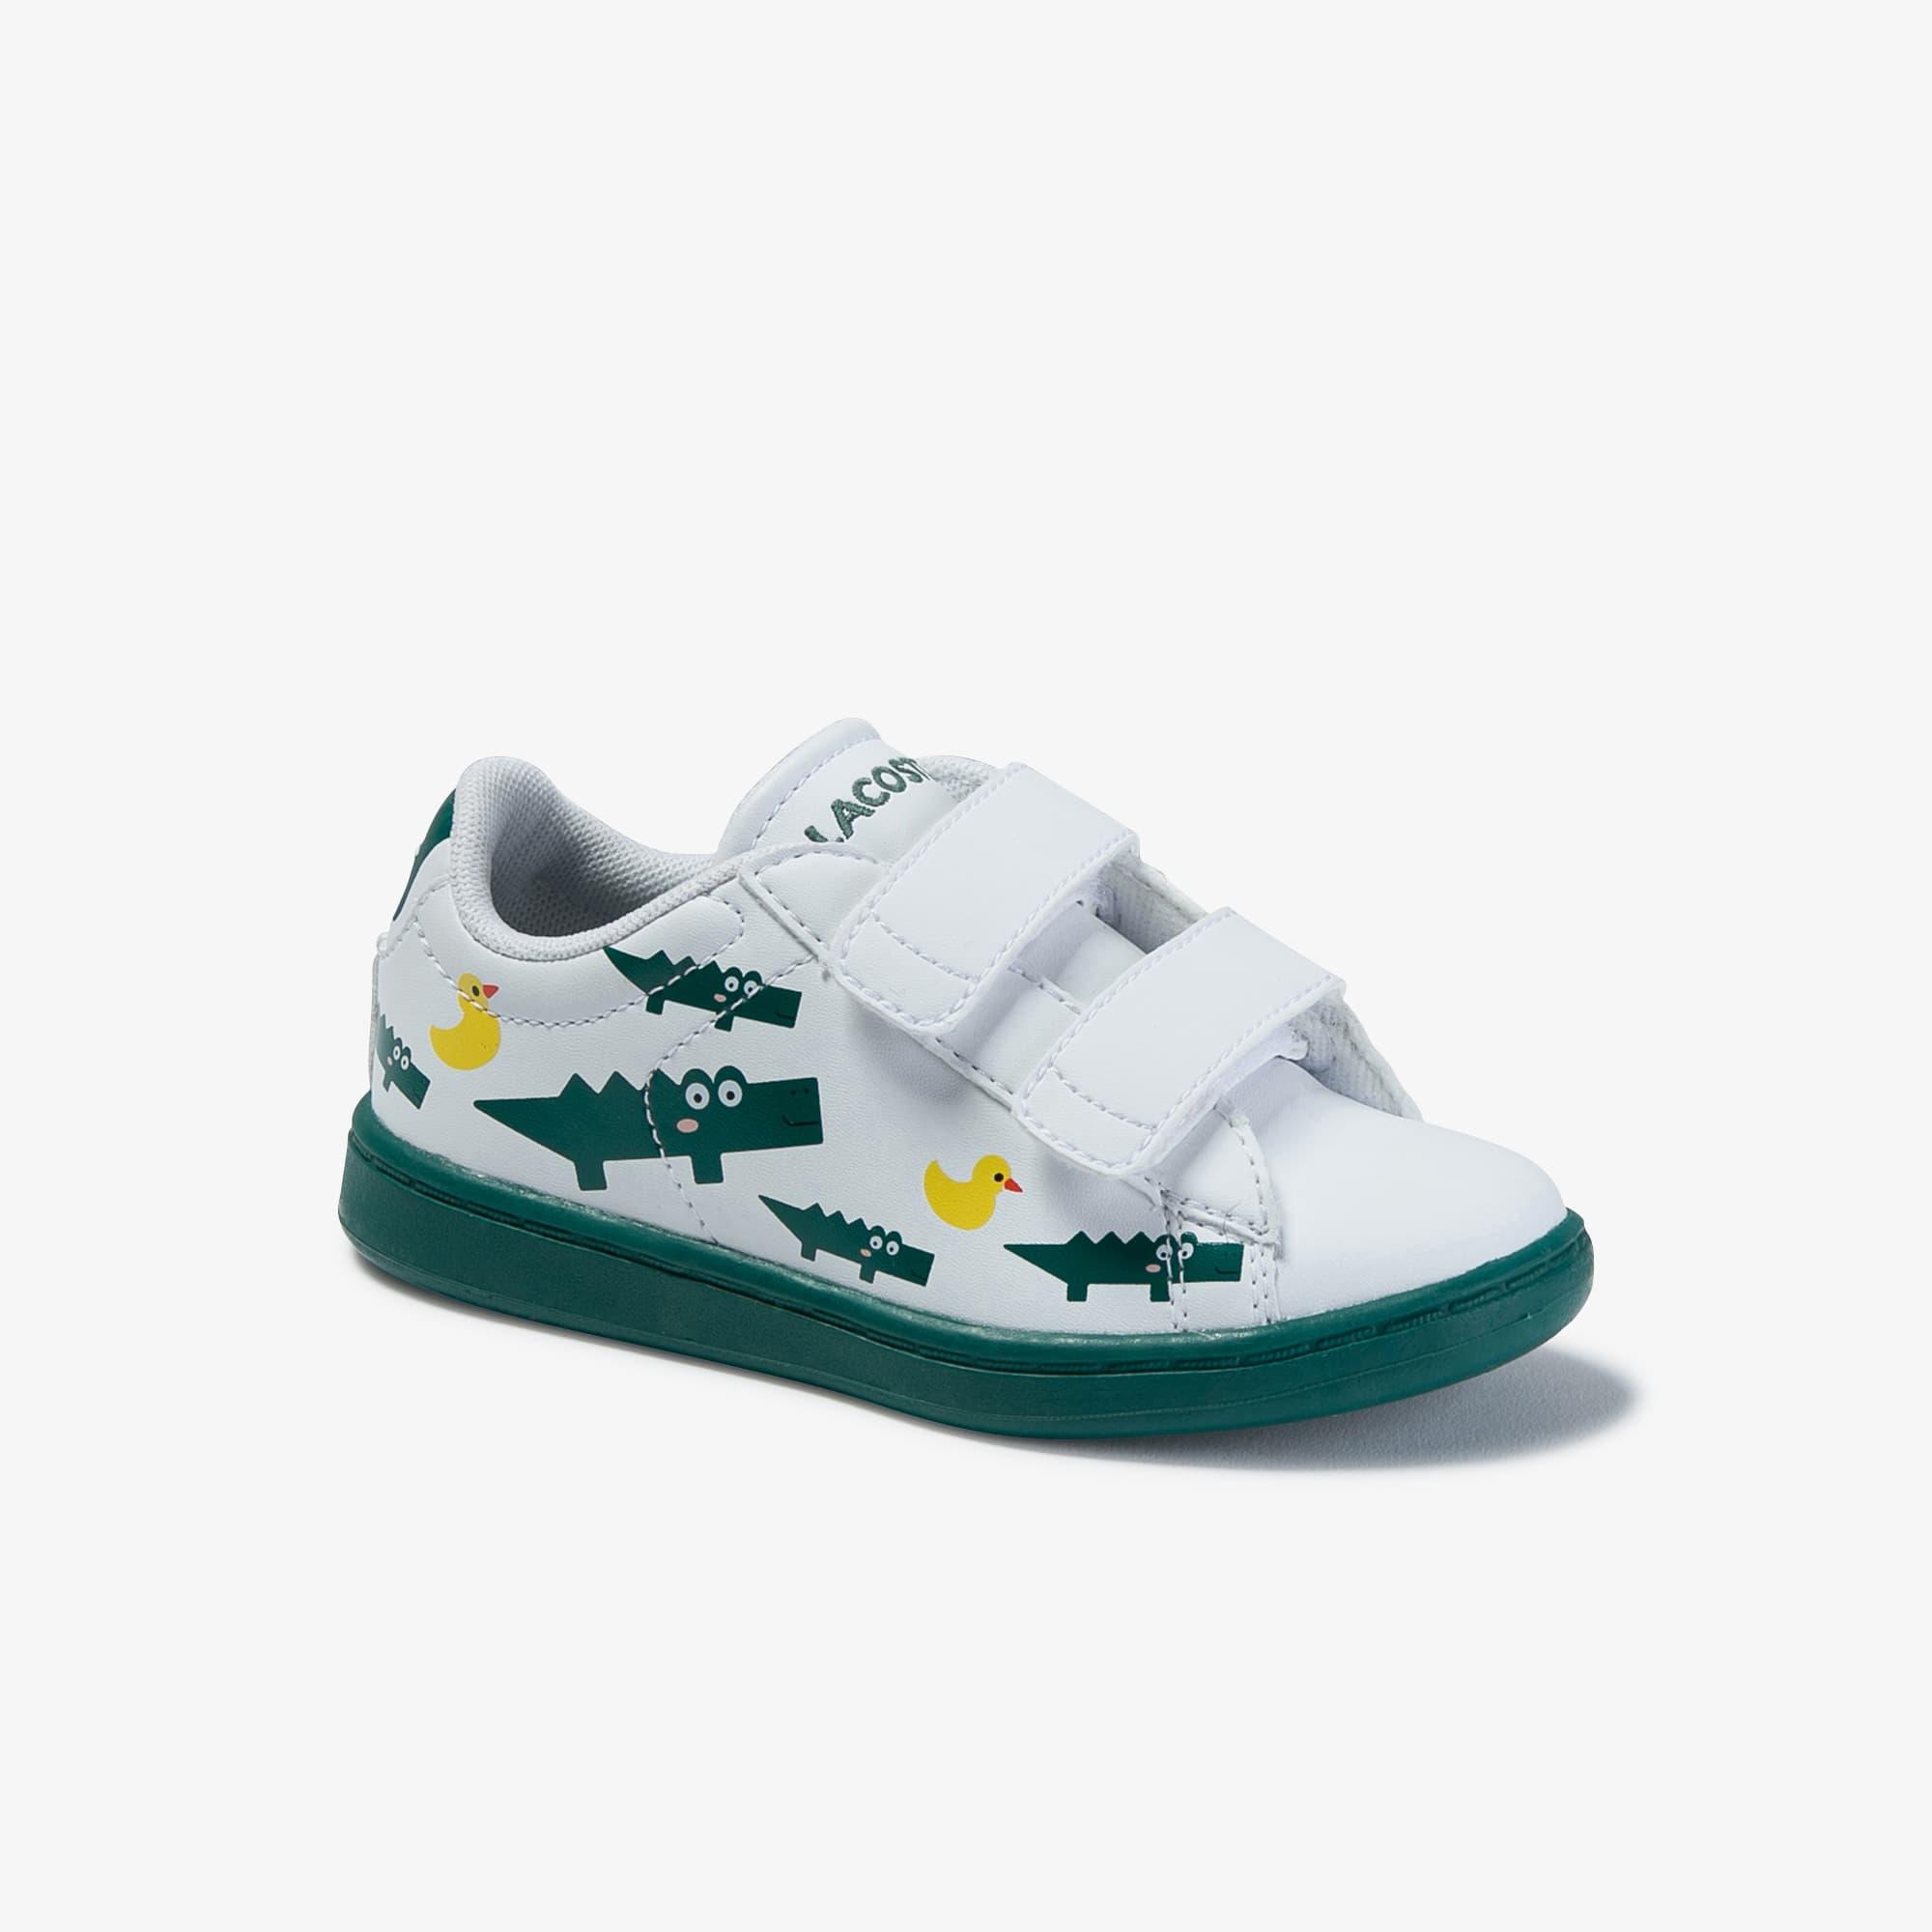 Kinder-Sneakers CARNABY EVO PRINT aus Synthetik